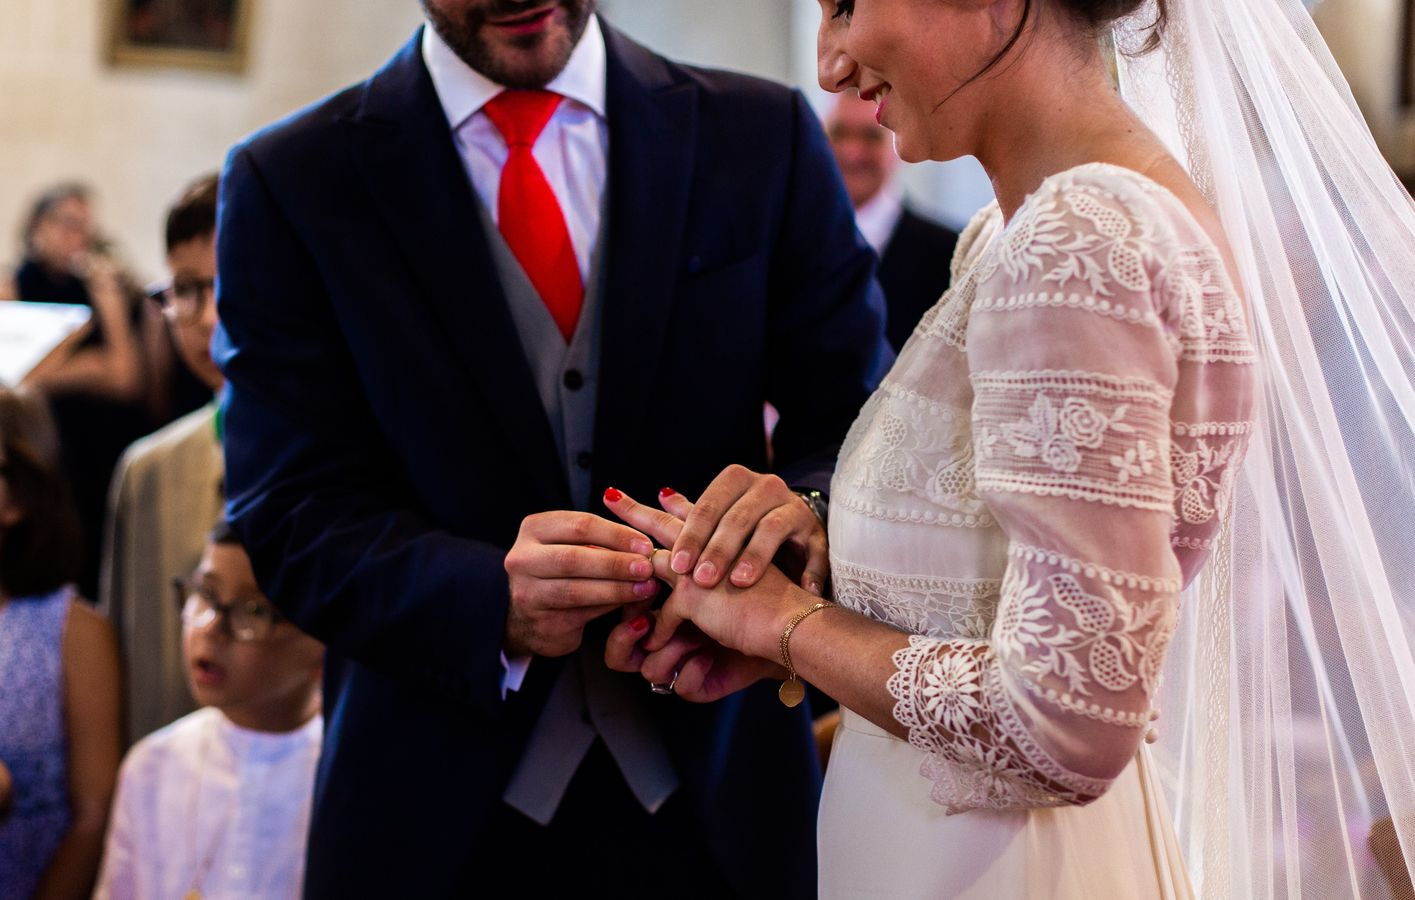 Mariage - Paroisse de Ploubalay